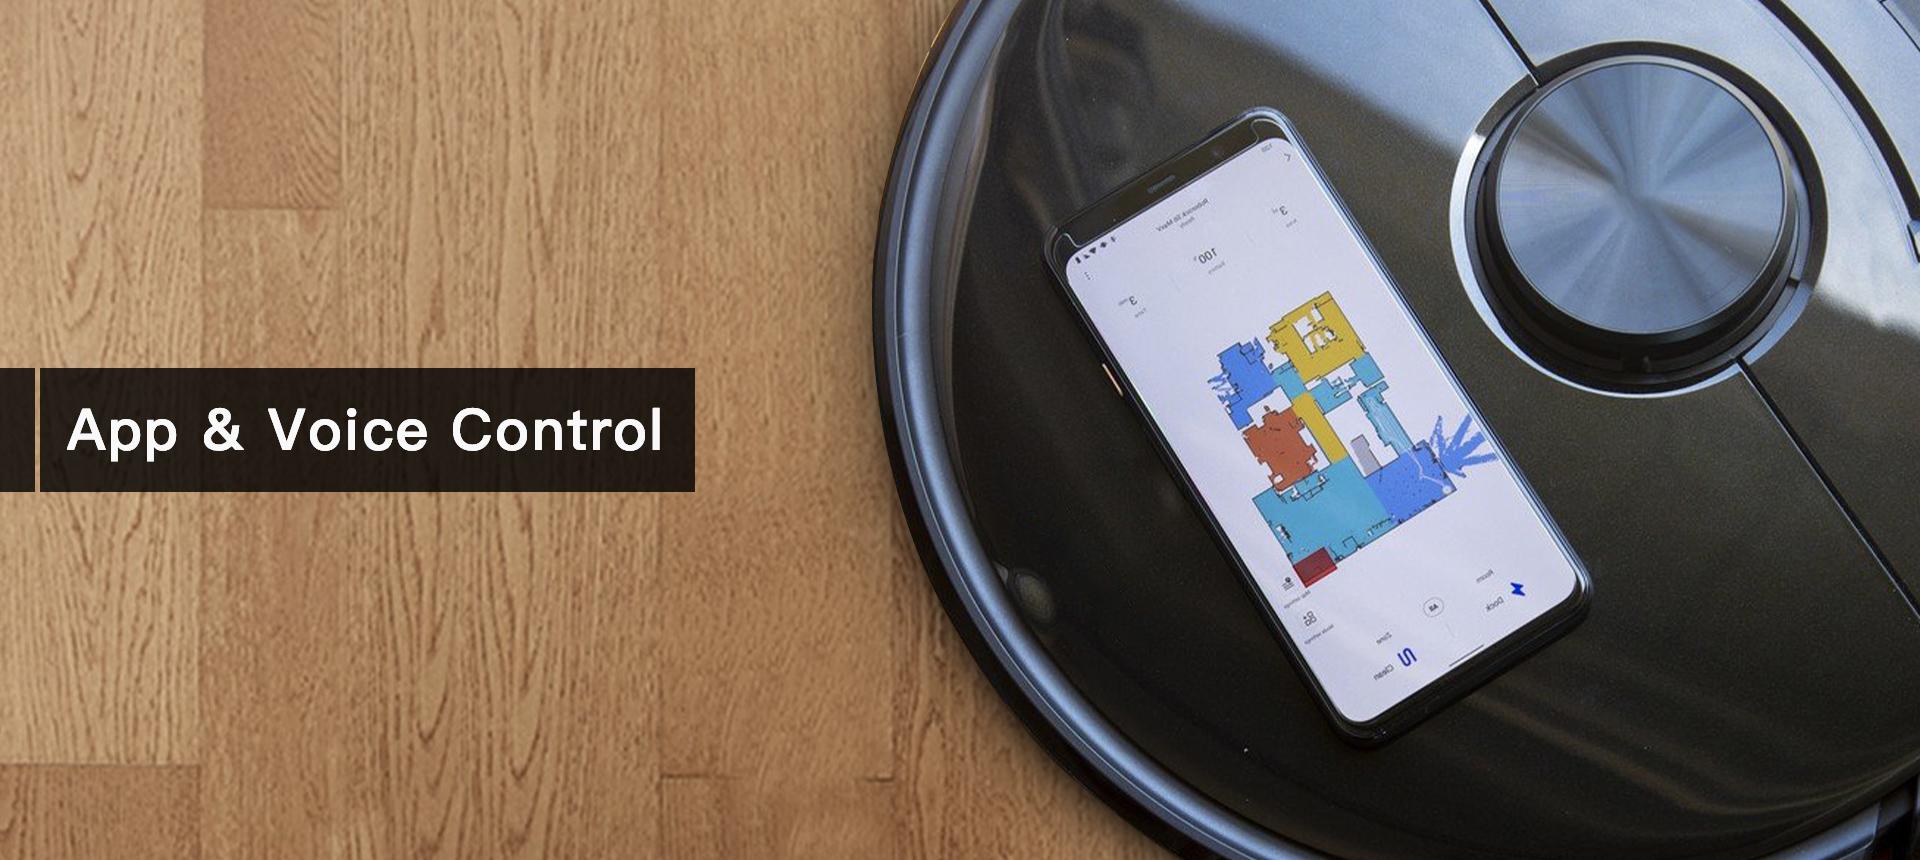 Roborock S6 Mobile App